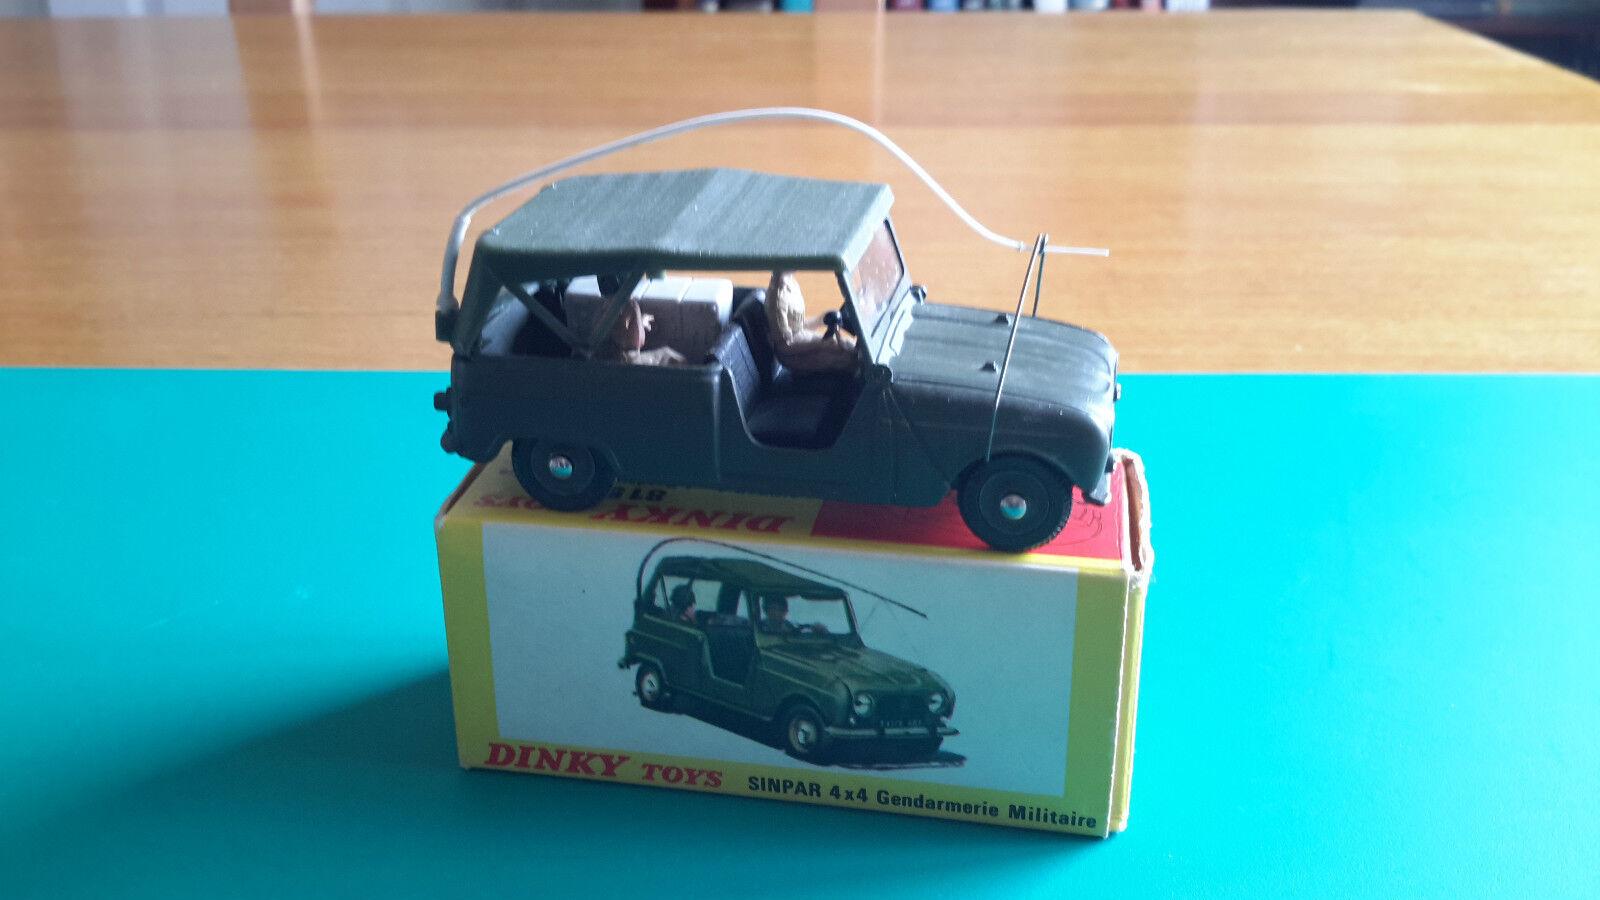 Vintage French Dinky  815 sinpar 4 x 4 Gendarmerie militaire & boxed Lot 1